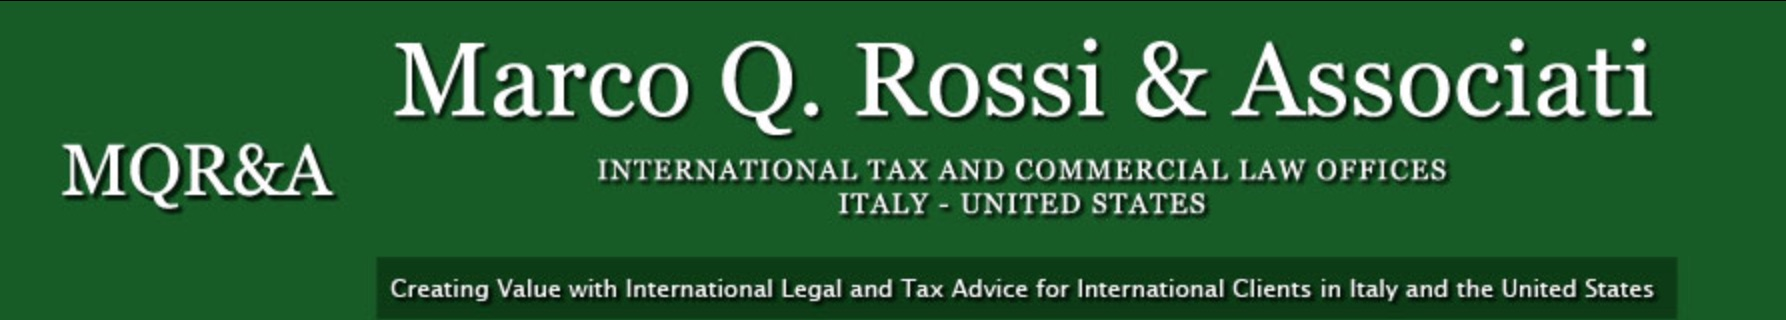 Marco Q. Rossi & Associati, PLLC